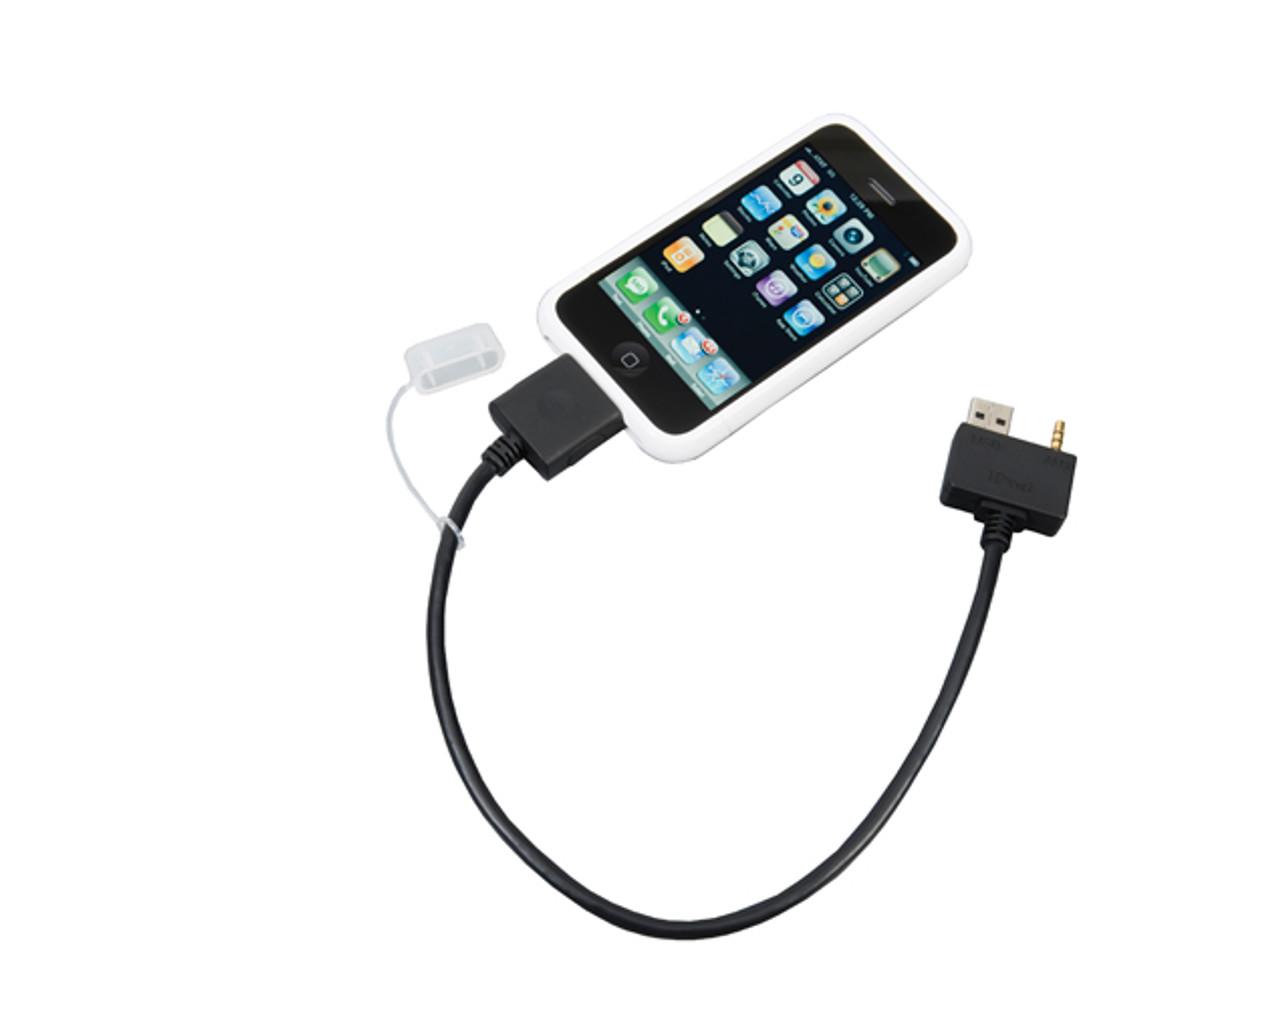 hyundai ipod power cable